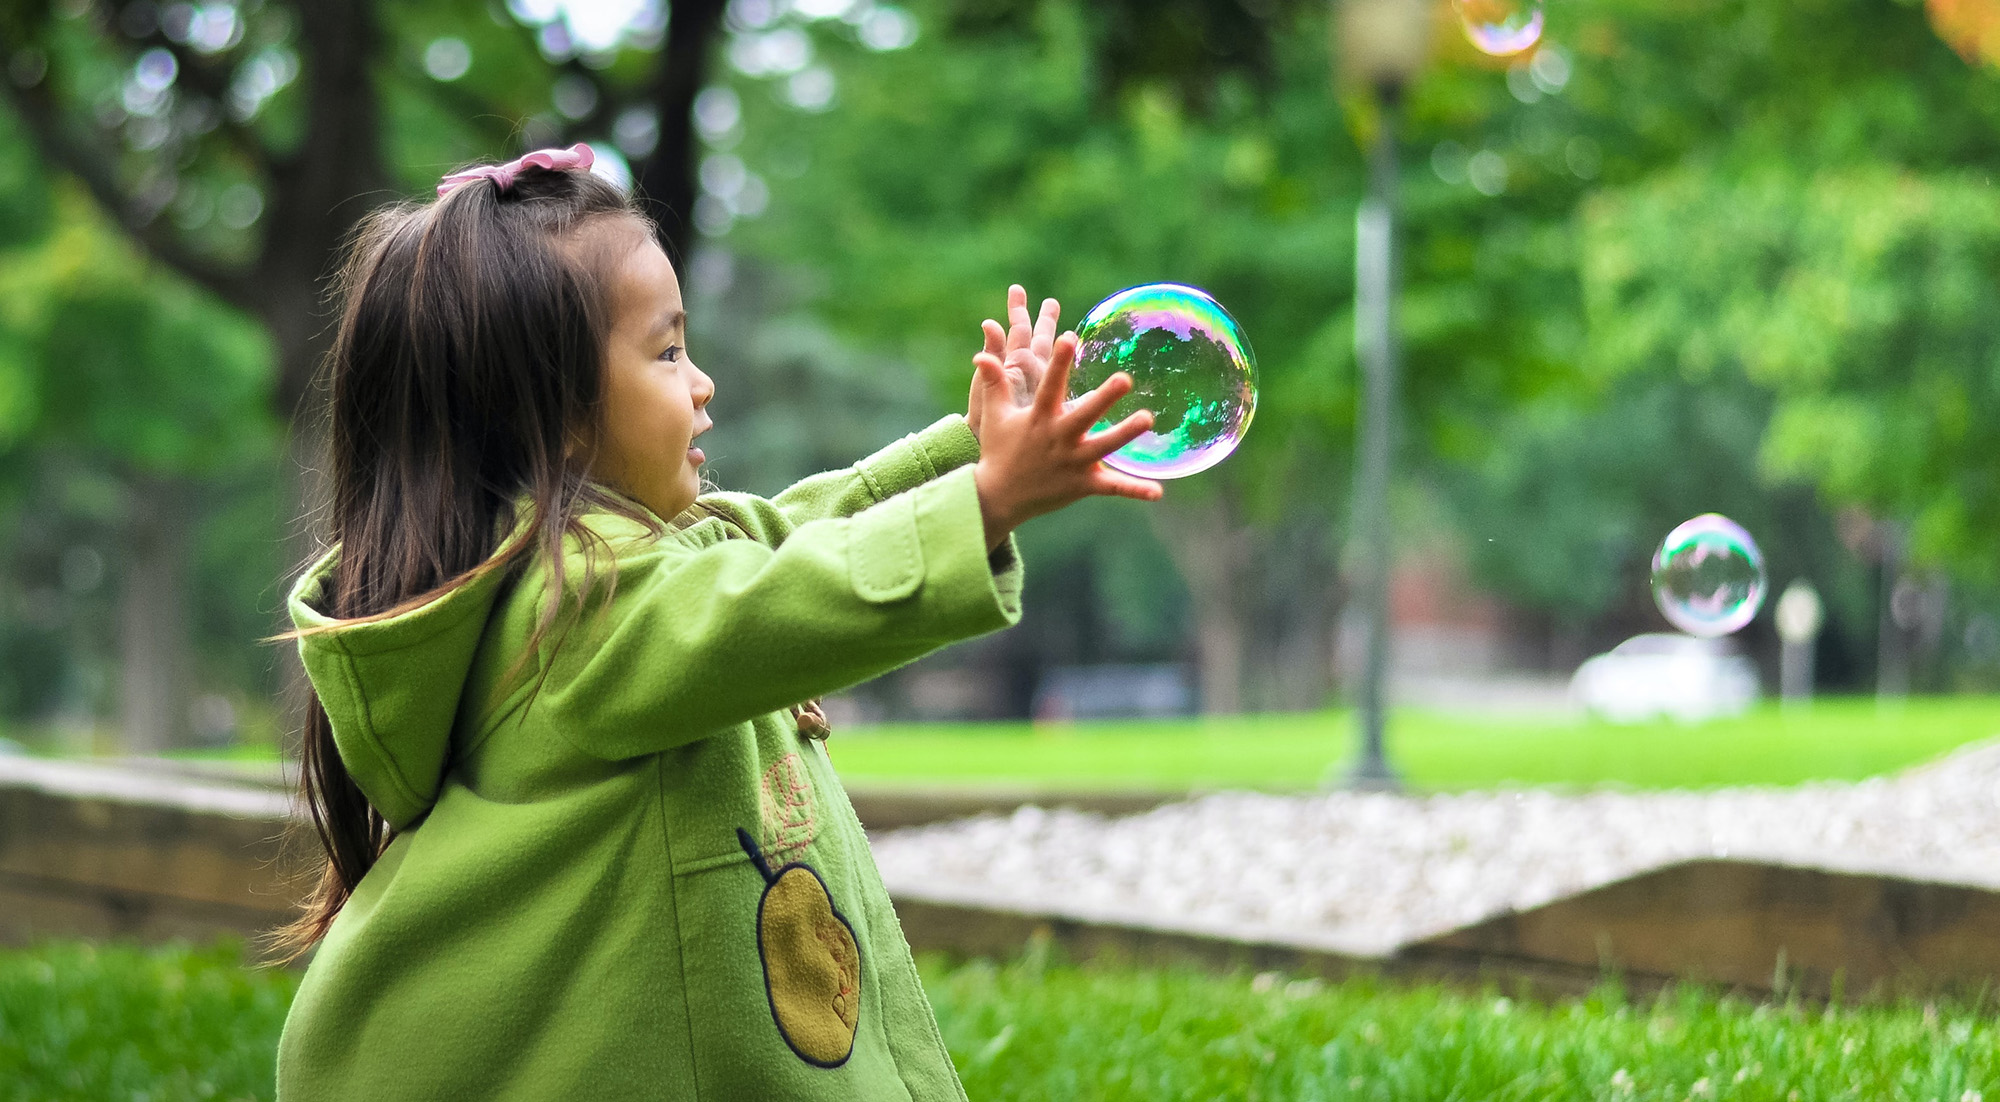 A preschooler in a green coat catching bubbles in a park